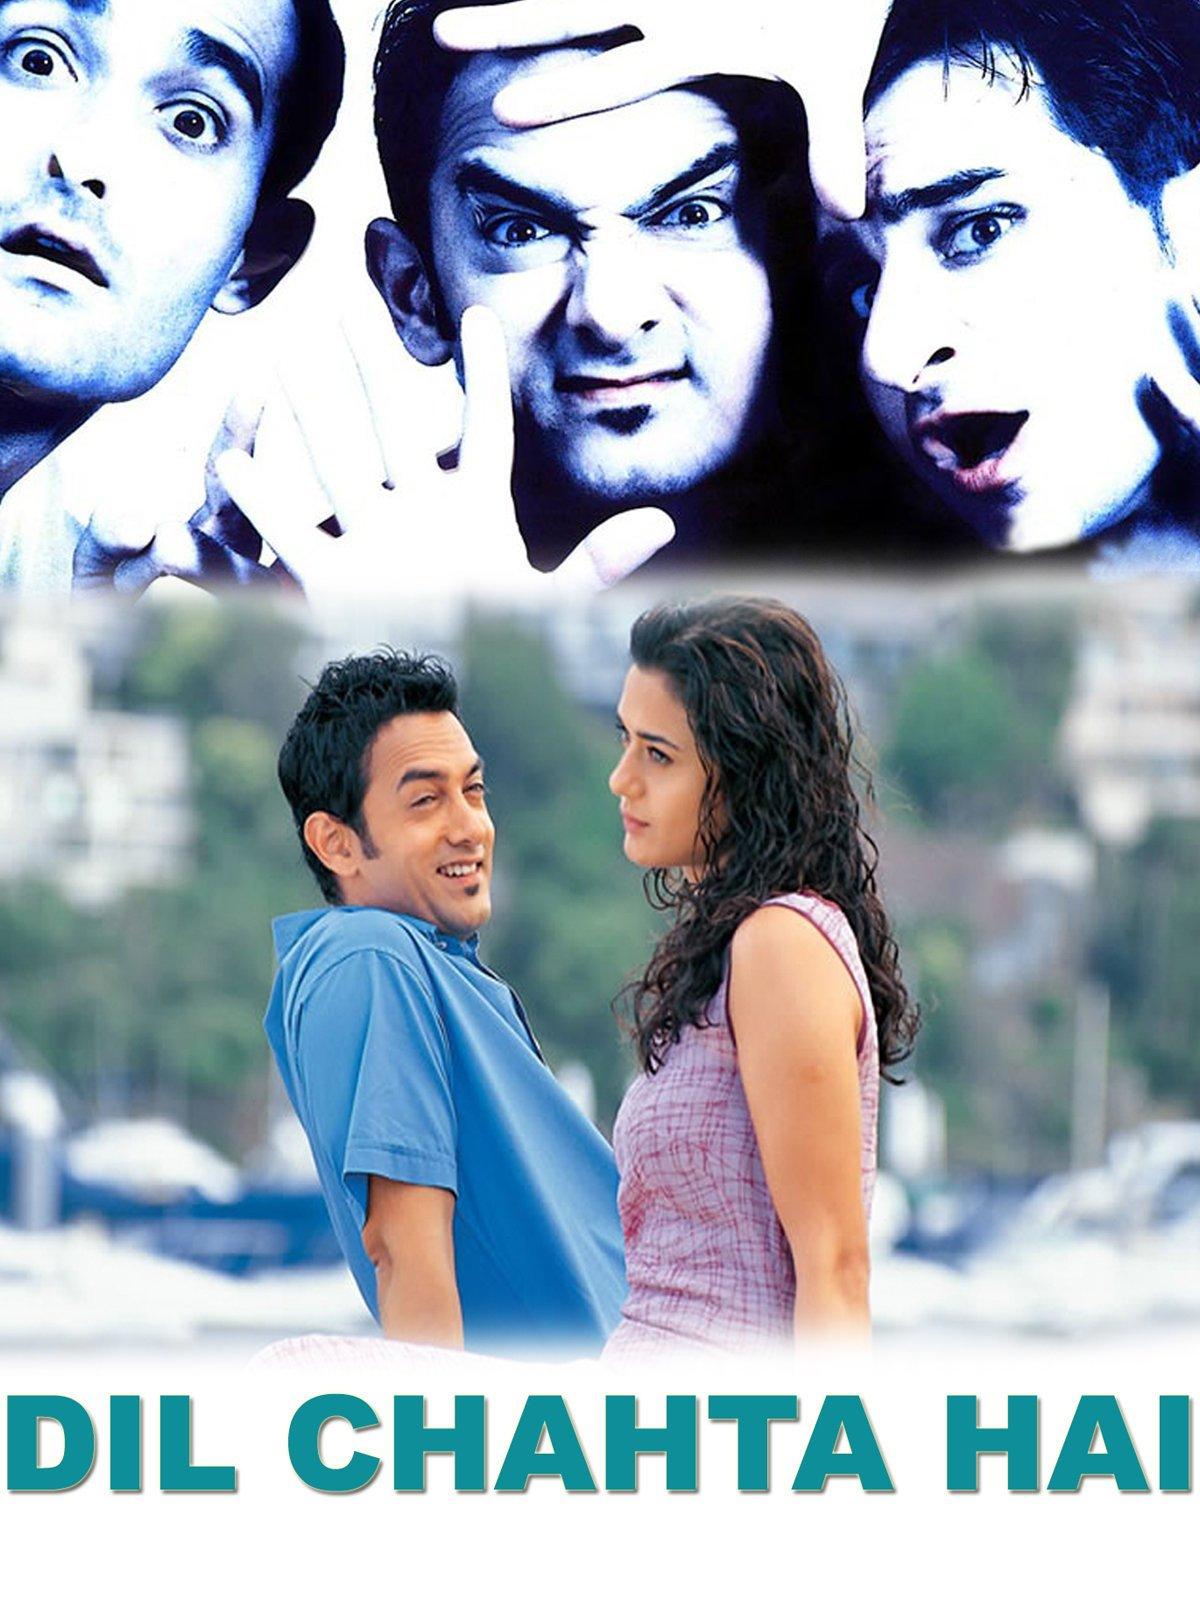 71QM2Bvvj6sL - Top 5 Bollywood Movies That Inspire Travel